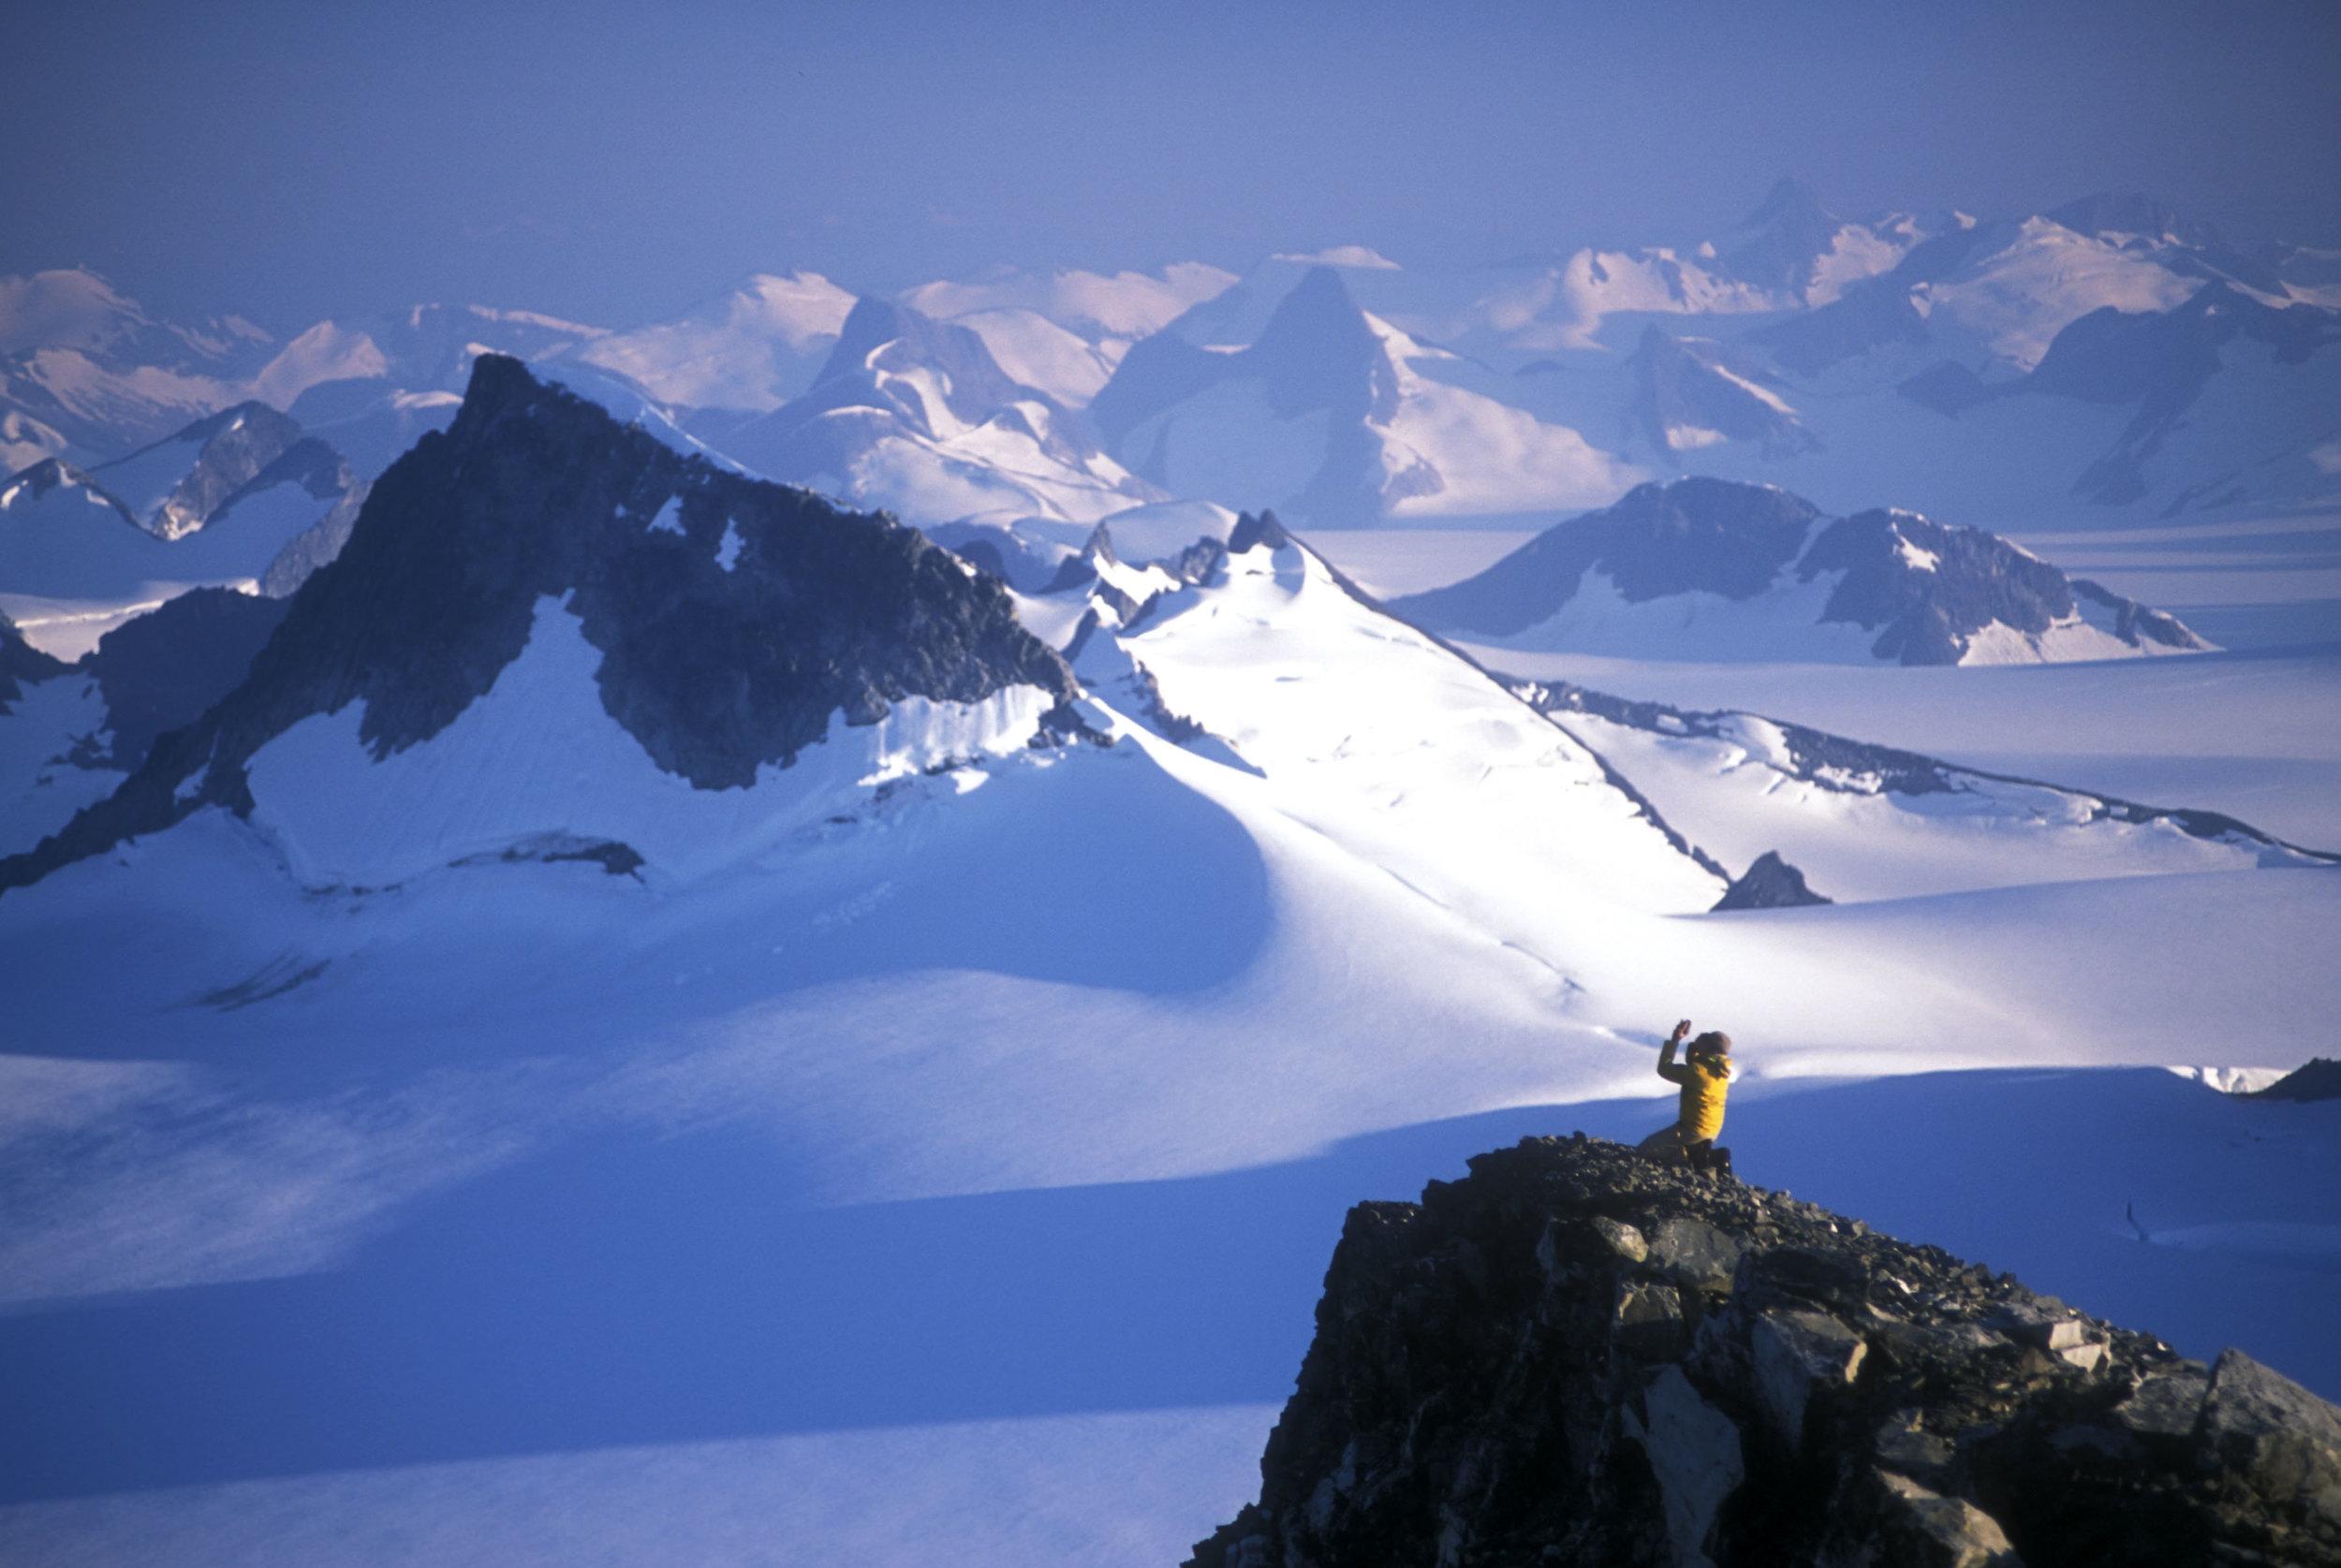 E Global Warming Alaska -Barbee_1.jpg